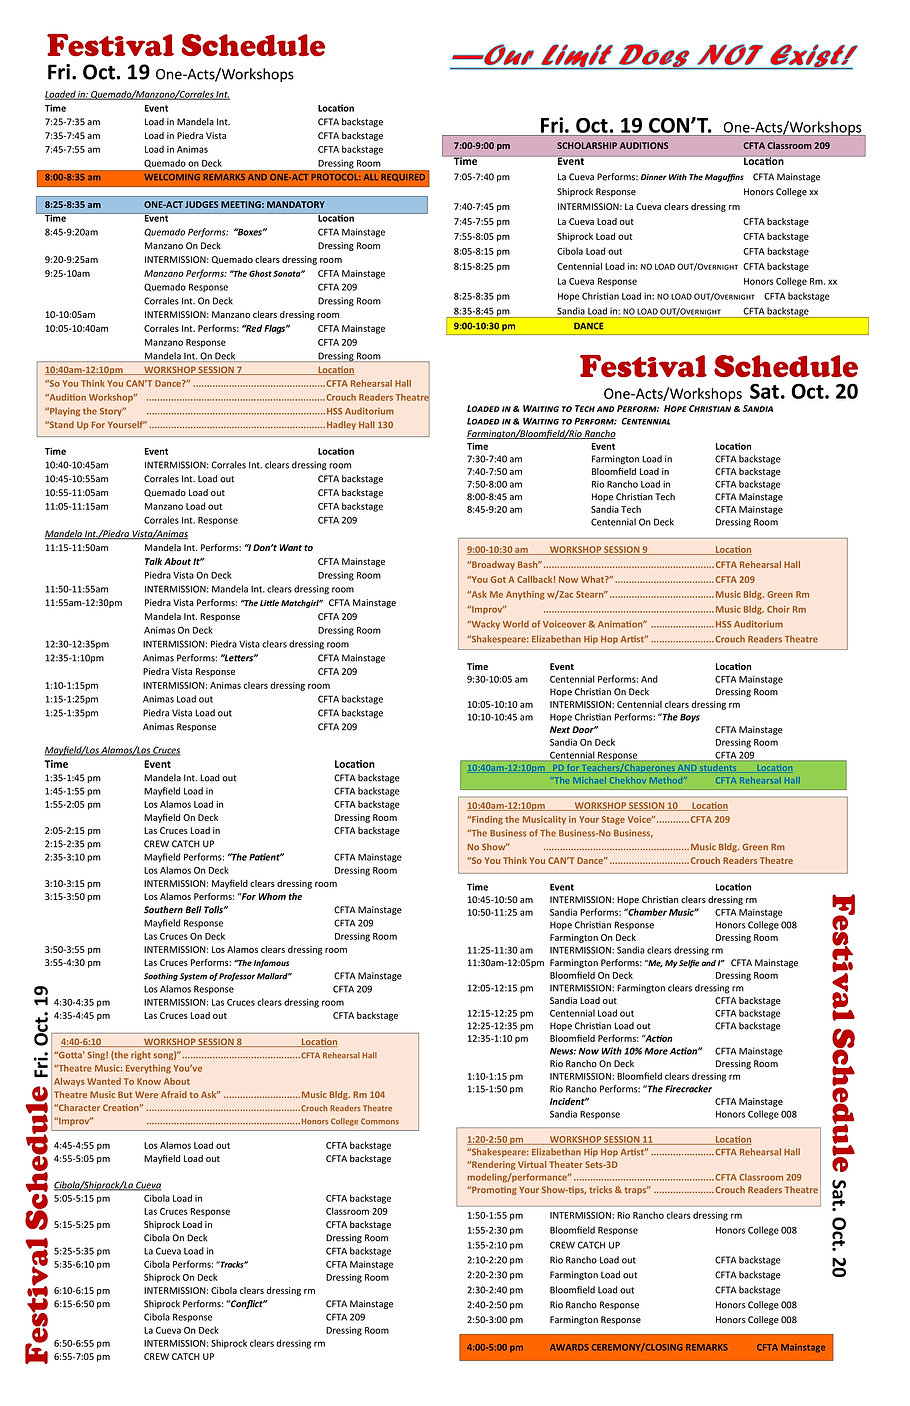 Final Festival Schedule pdf-2.jpg